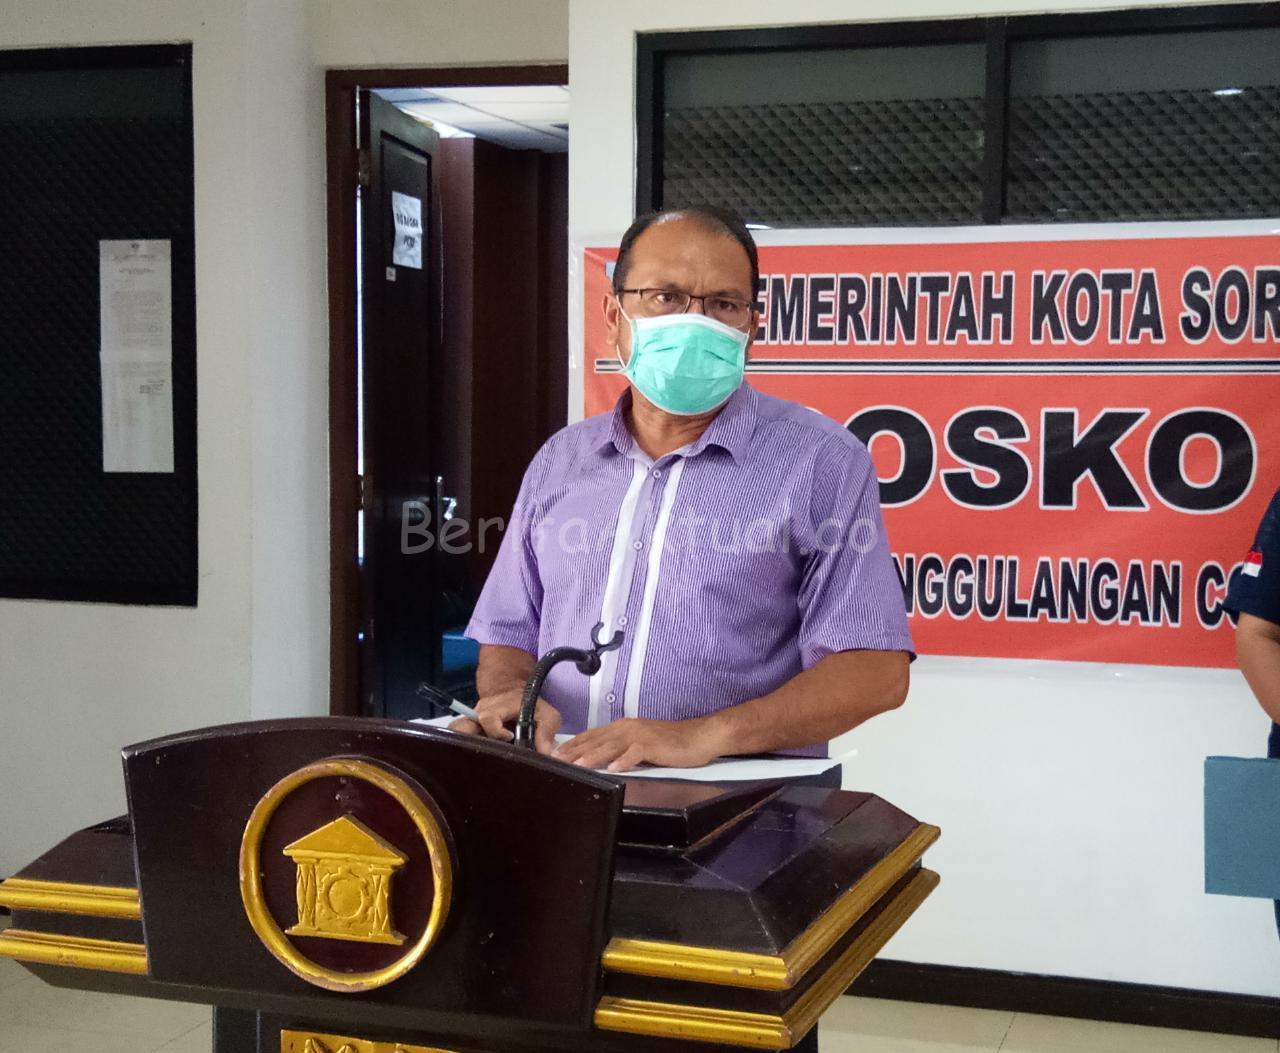 Pemkot Sorong Siapkan Lahan Pemakaman Jenazah Covid-19 di Kilometer 12 Masuk 25 IMG 20200404 WA0041